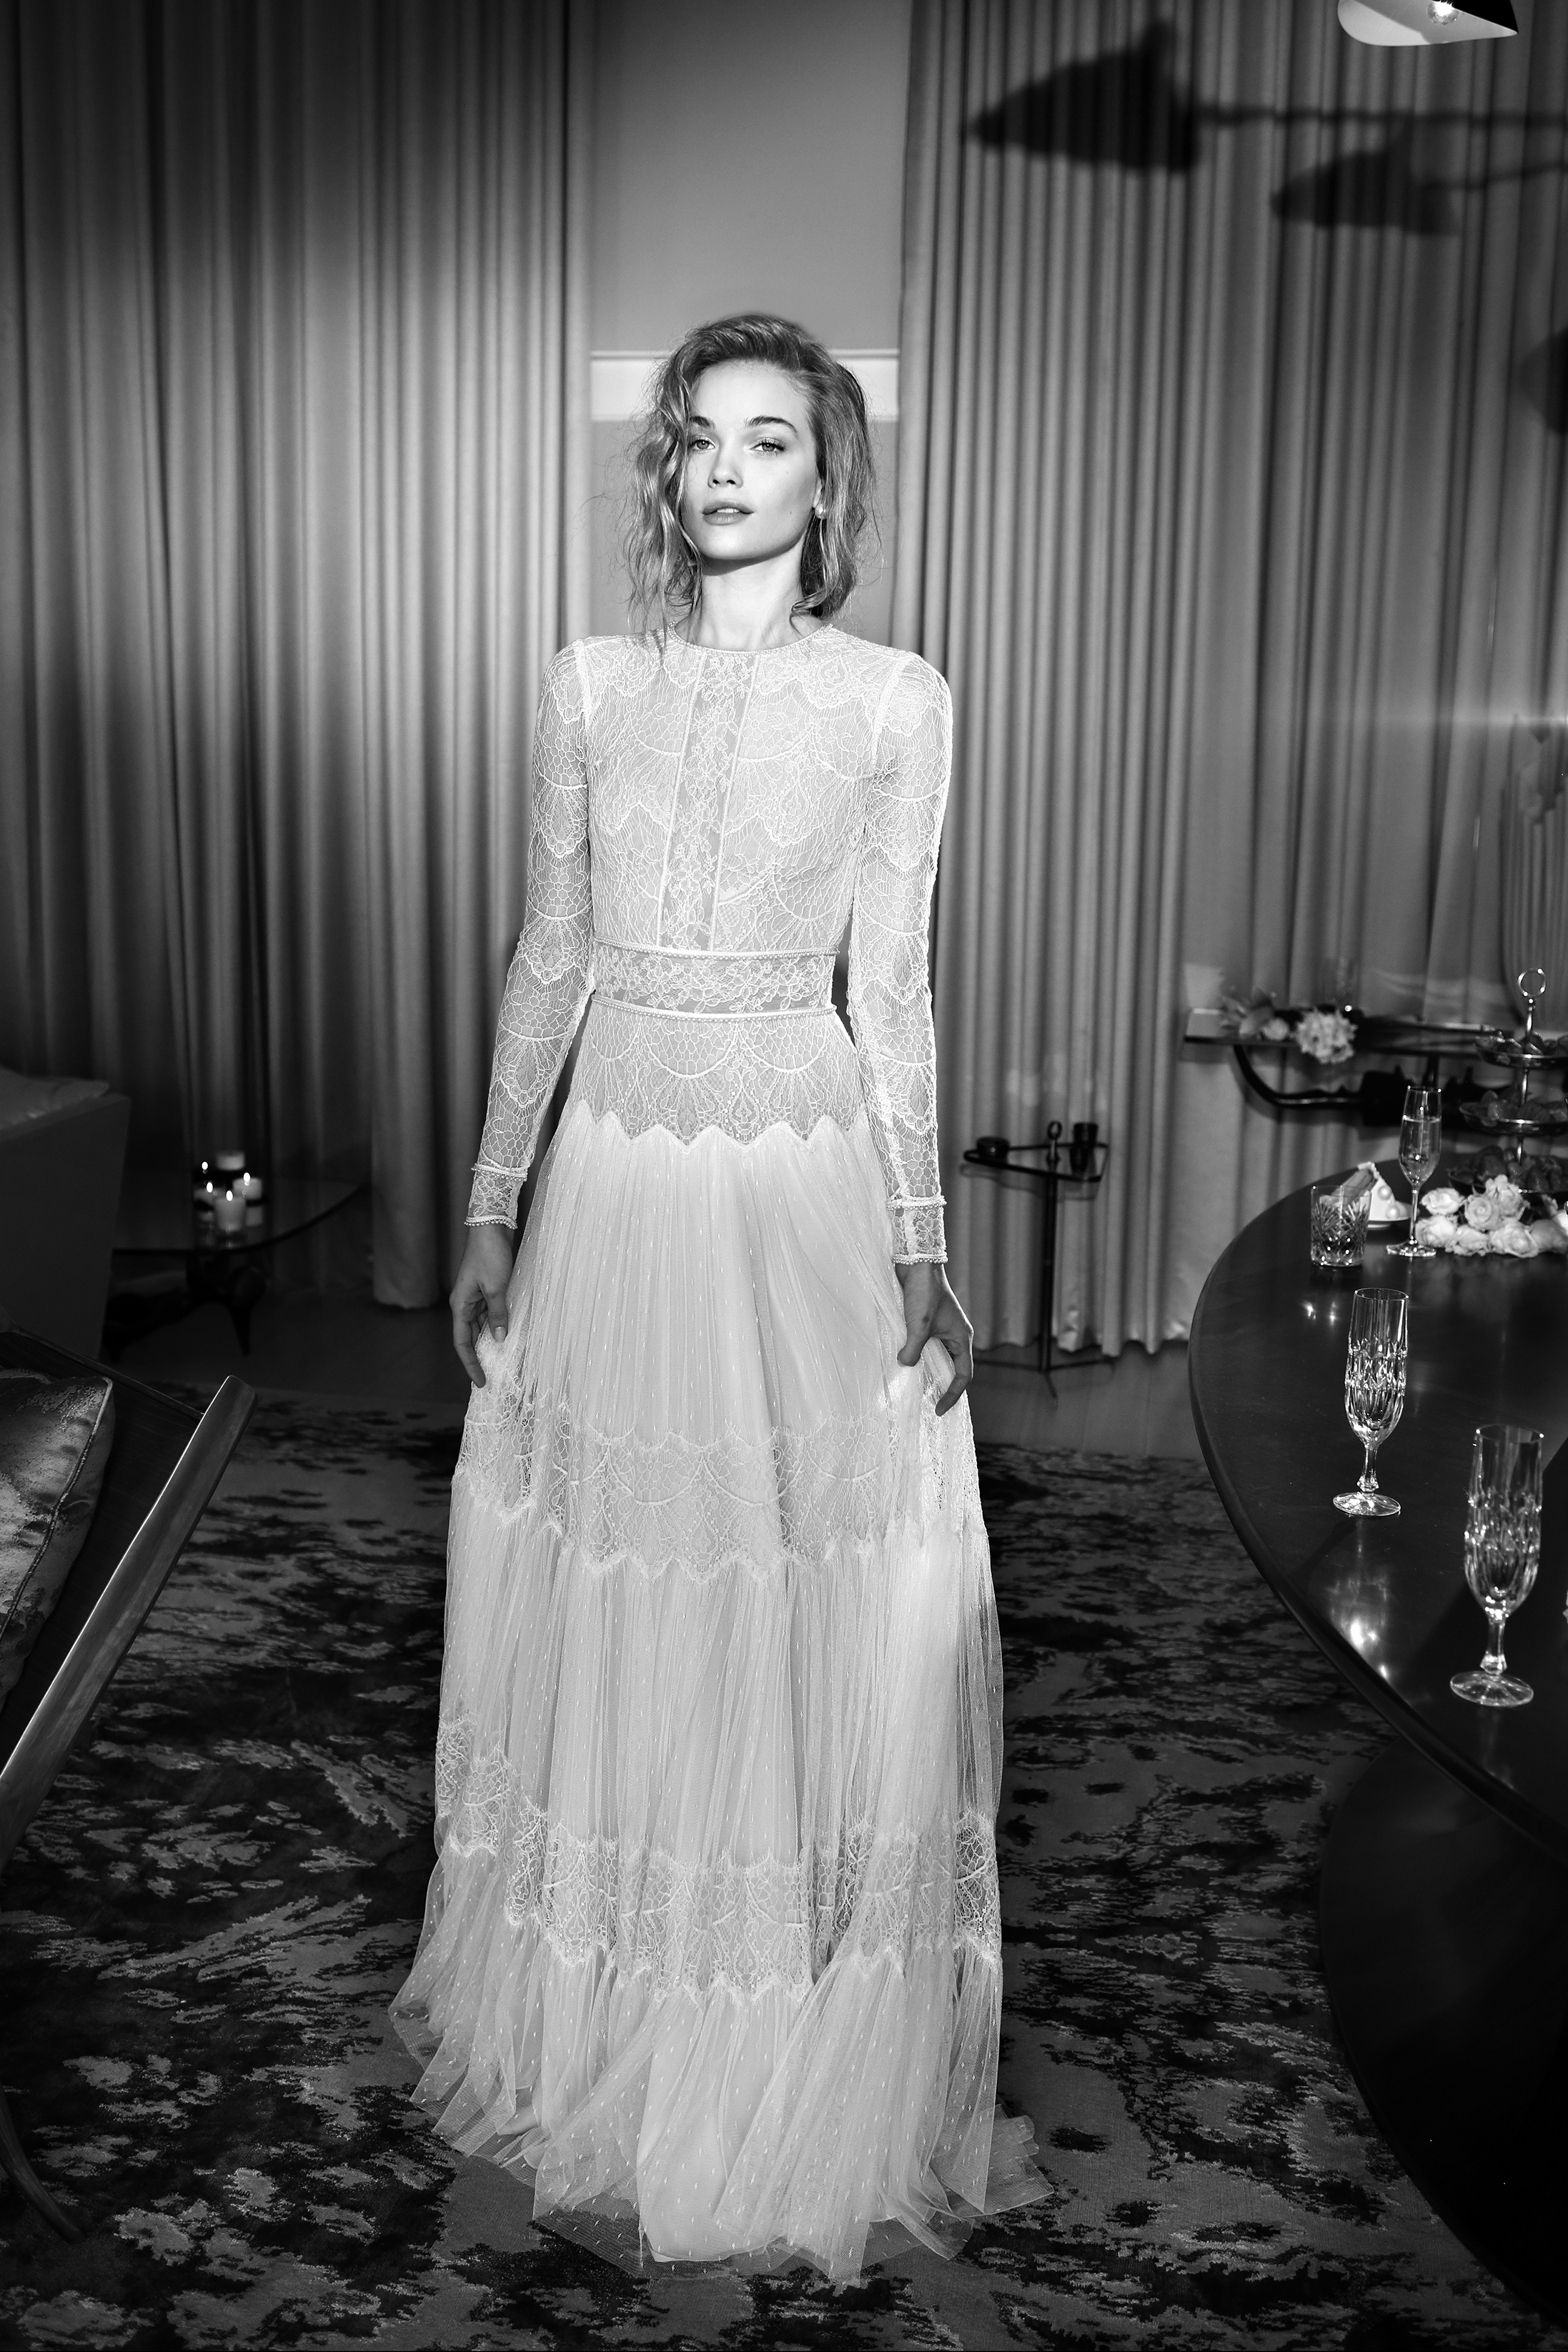 lihi-hod-favorite-wedding-dress-design-sophia-0916